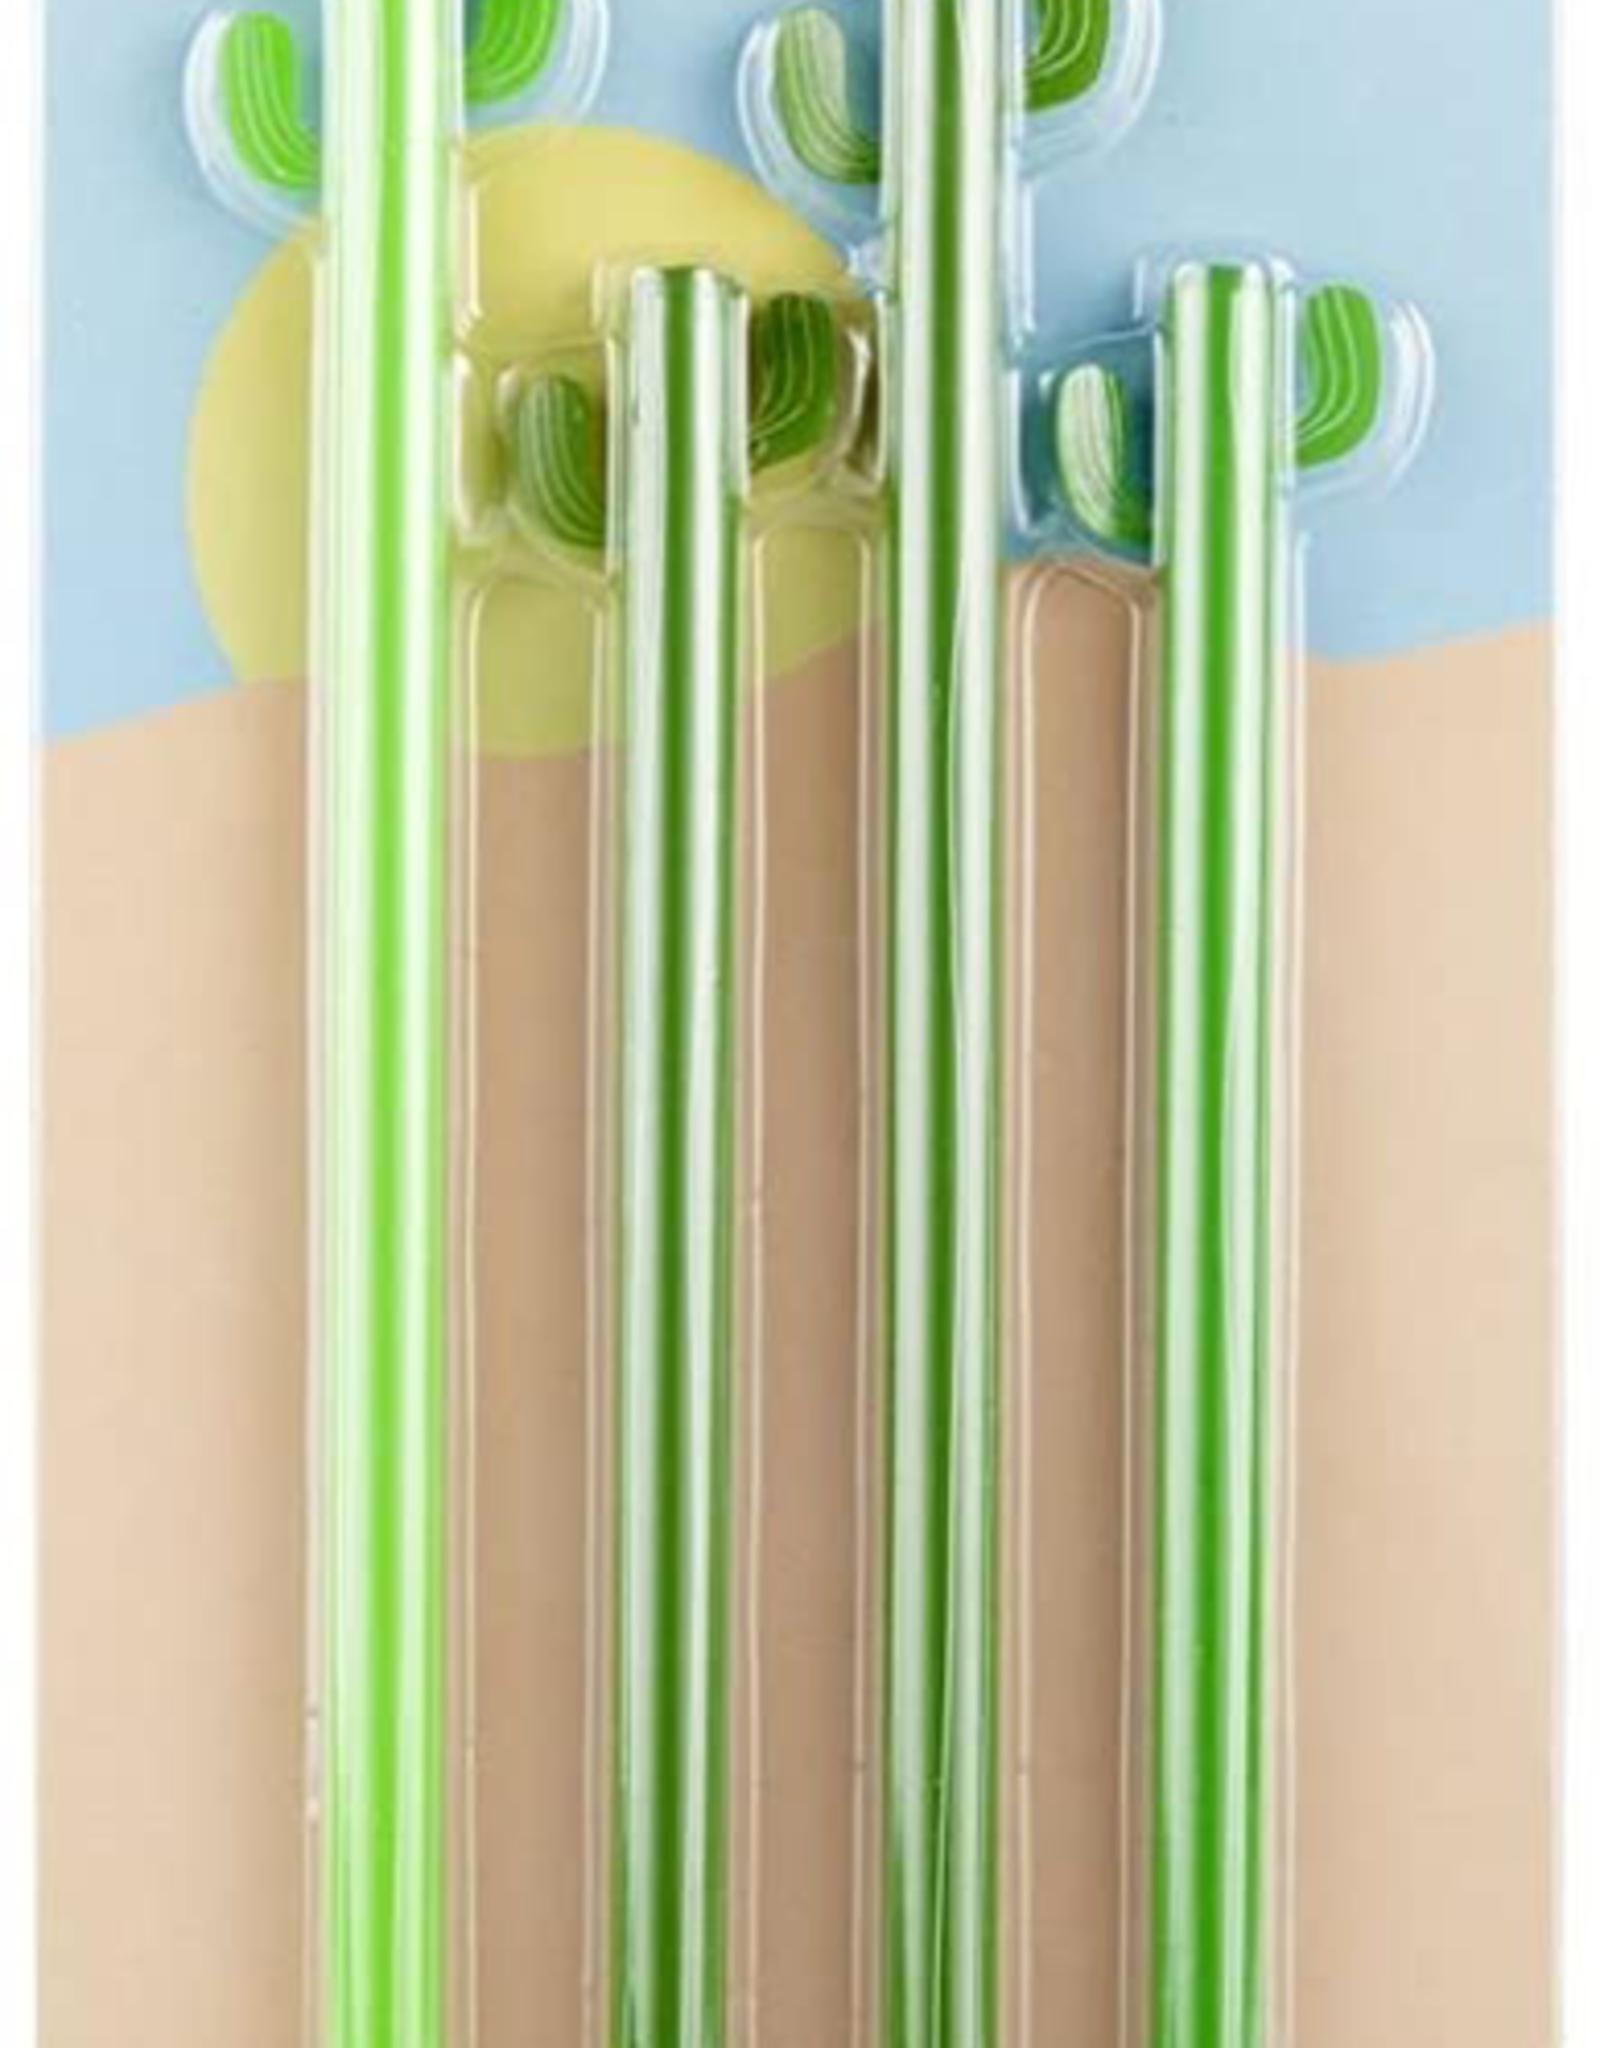 Kikkerland Kikkerland Cactus Pencils